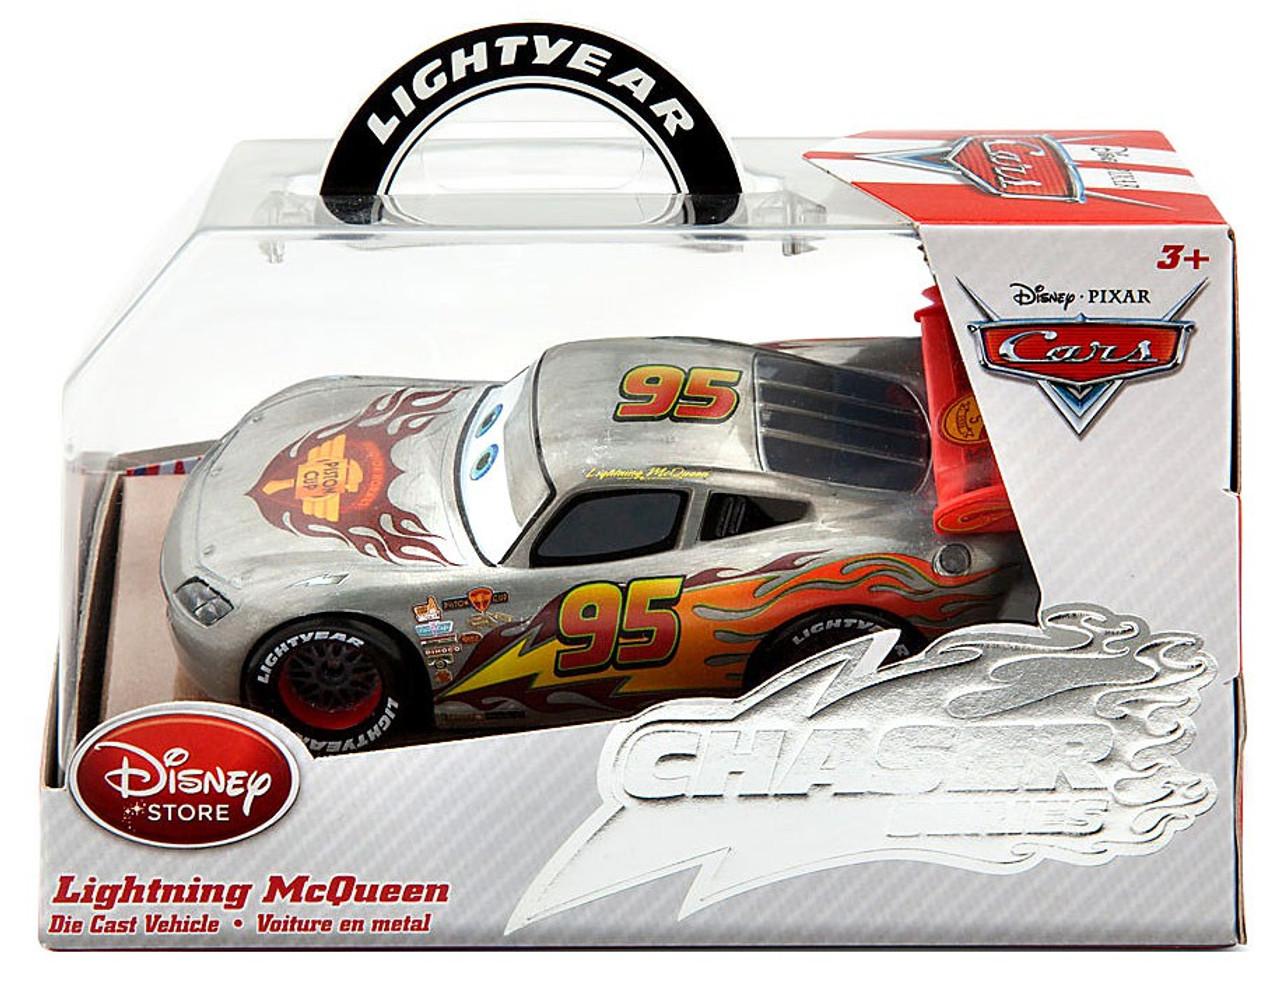 Disney Cars Diecast: Disney Pixar Chaser Series Lightning McQueen 143 Diecast